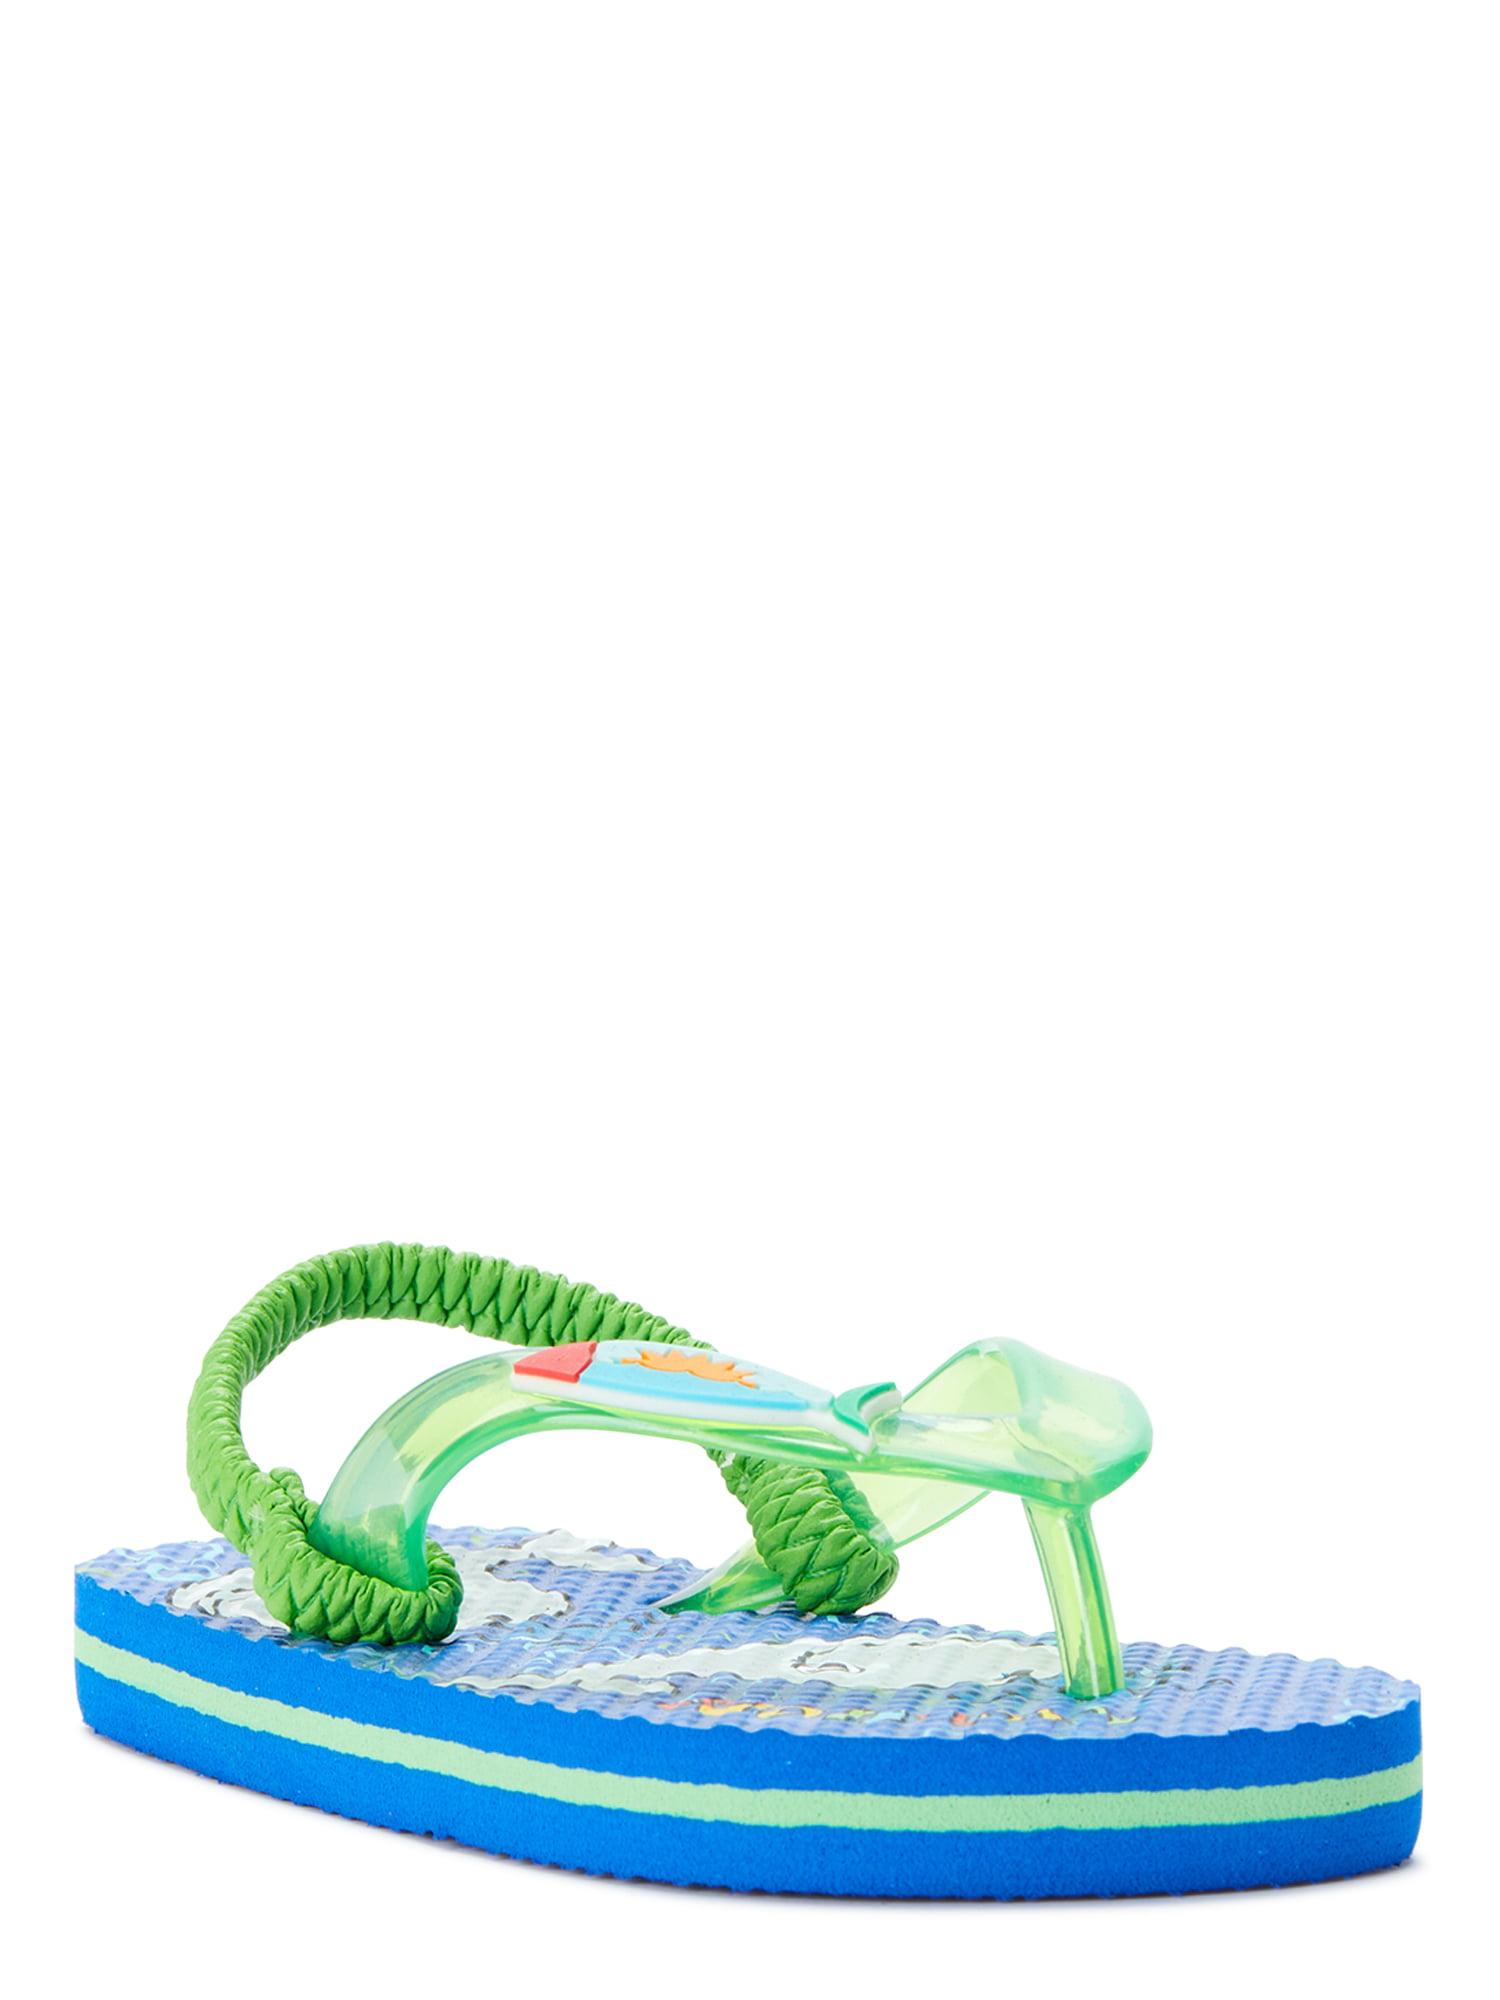 Fish Flops Toddler Boys Sandals